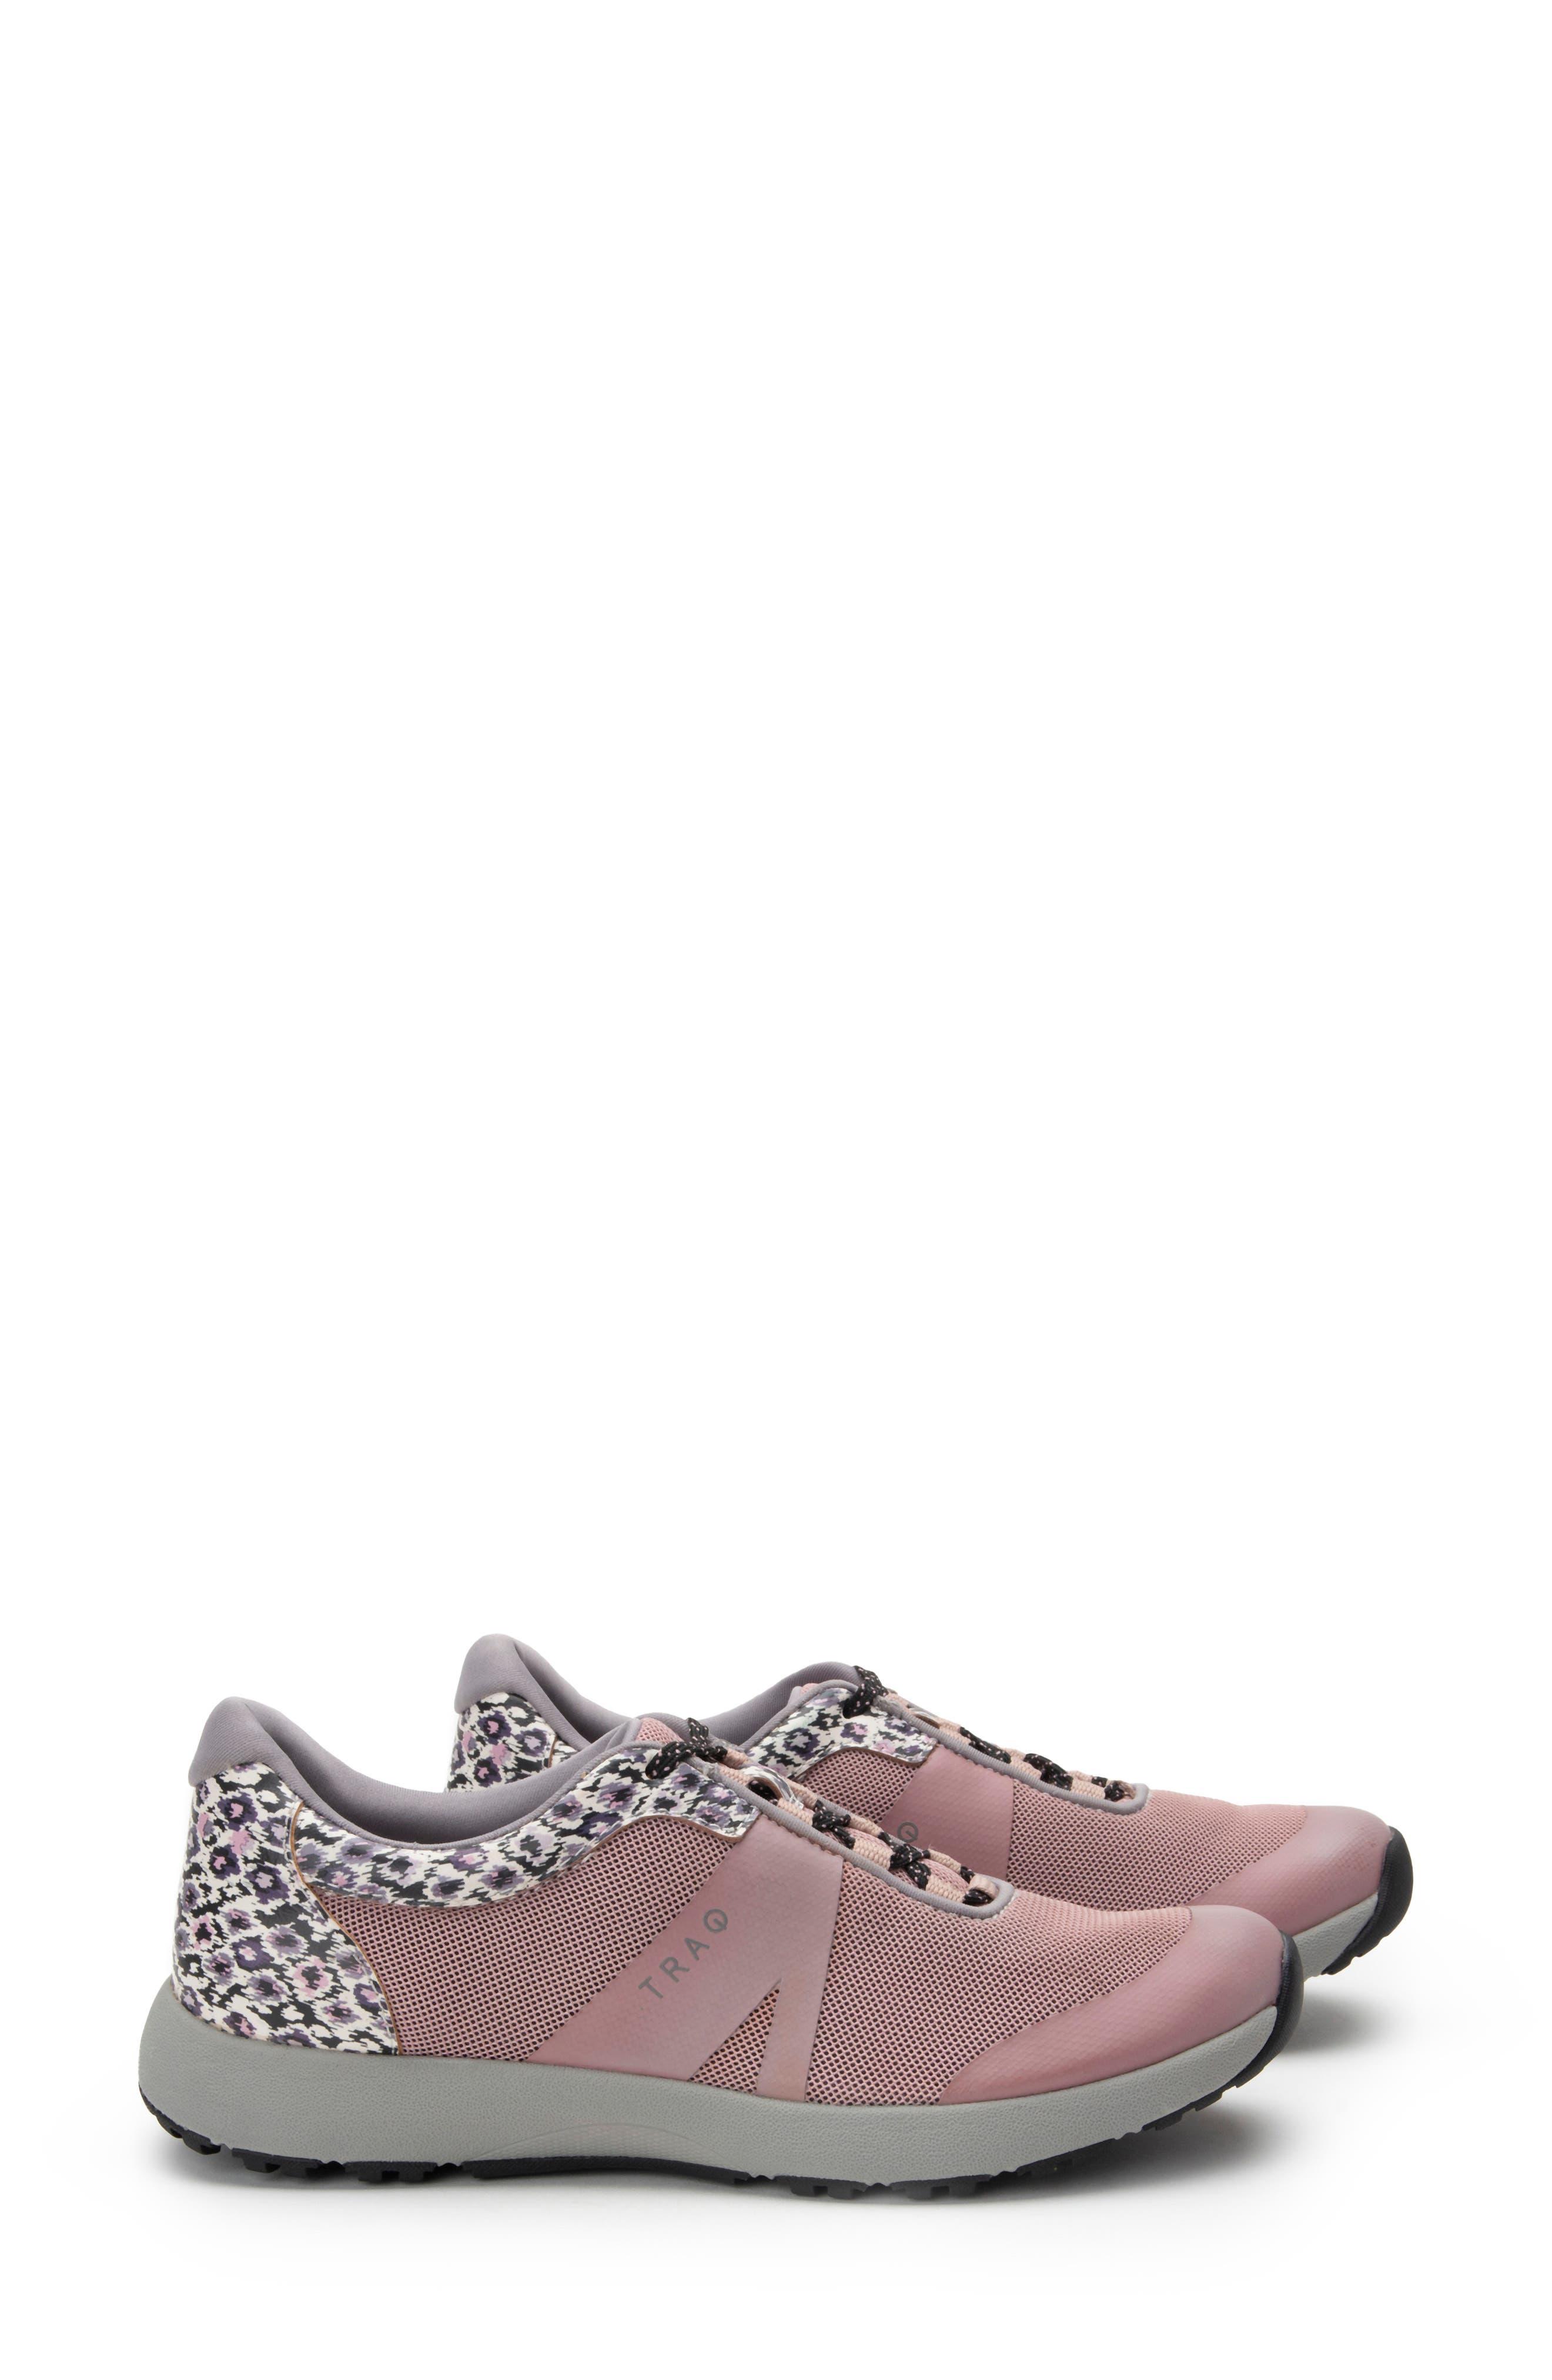 Women's Traq By Alegria Intent Sneaker